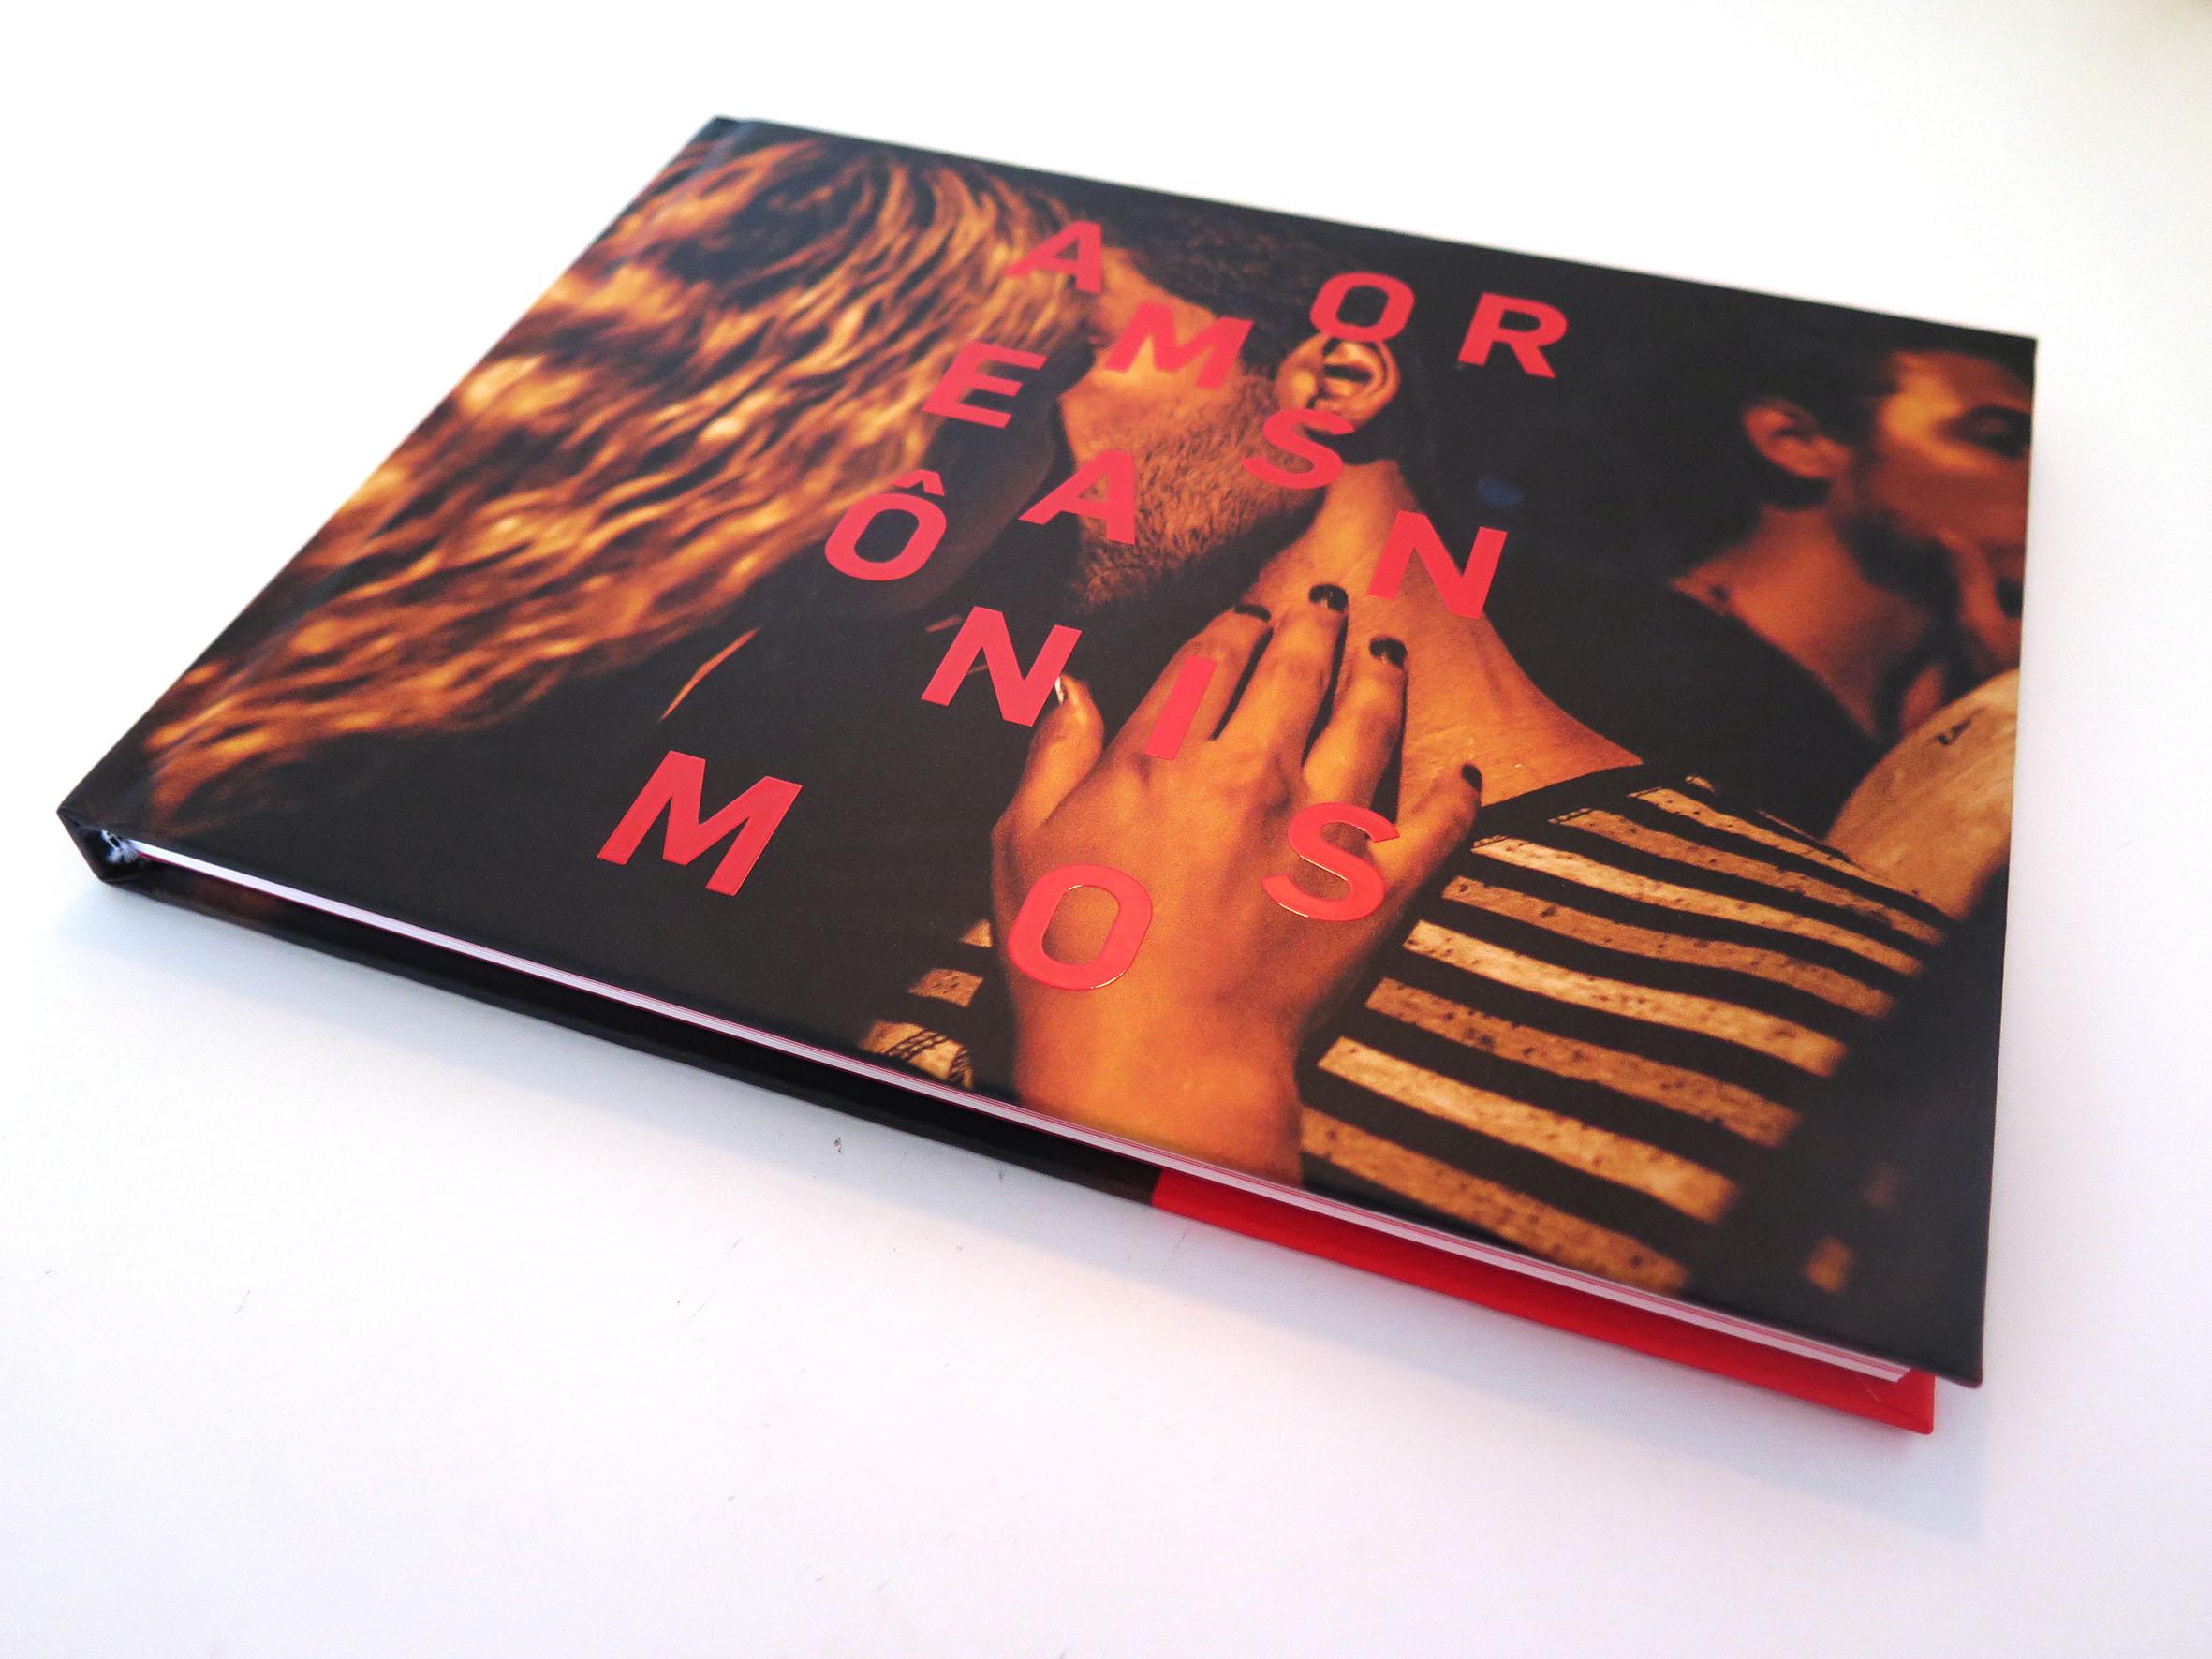 amoresanonimos-livro-amores-ano%cc%82nimos